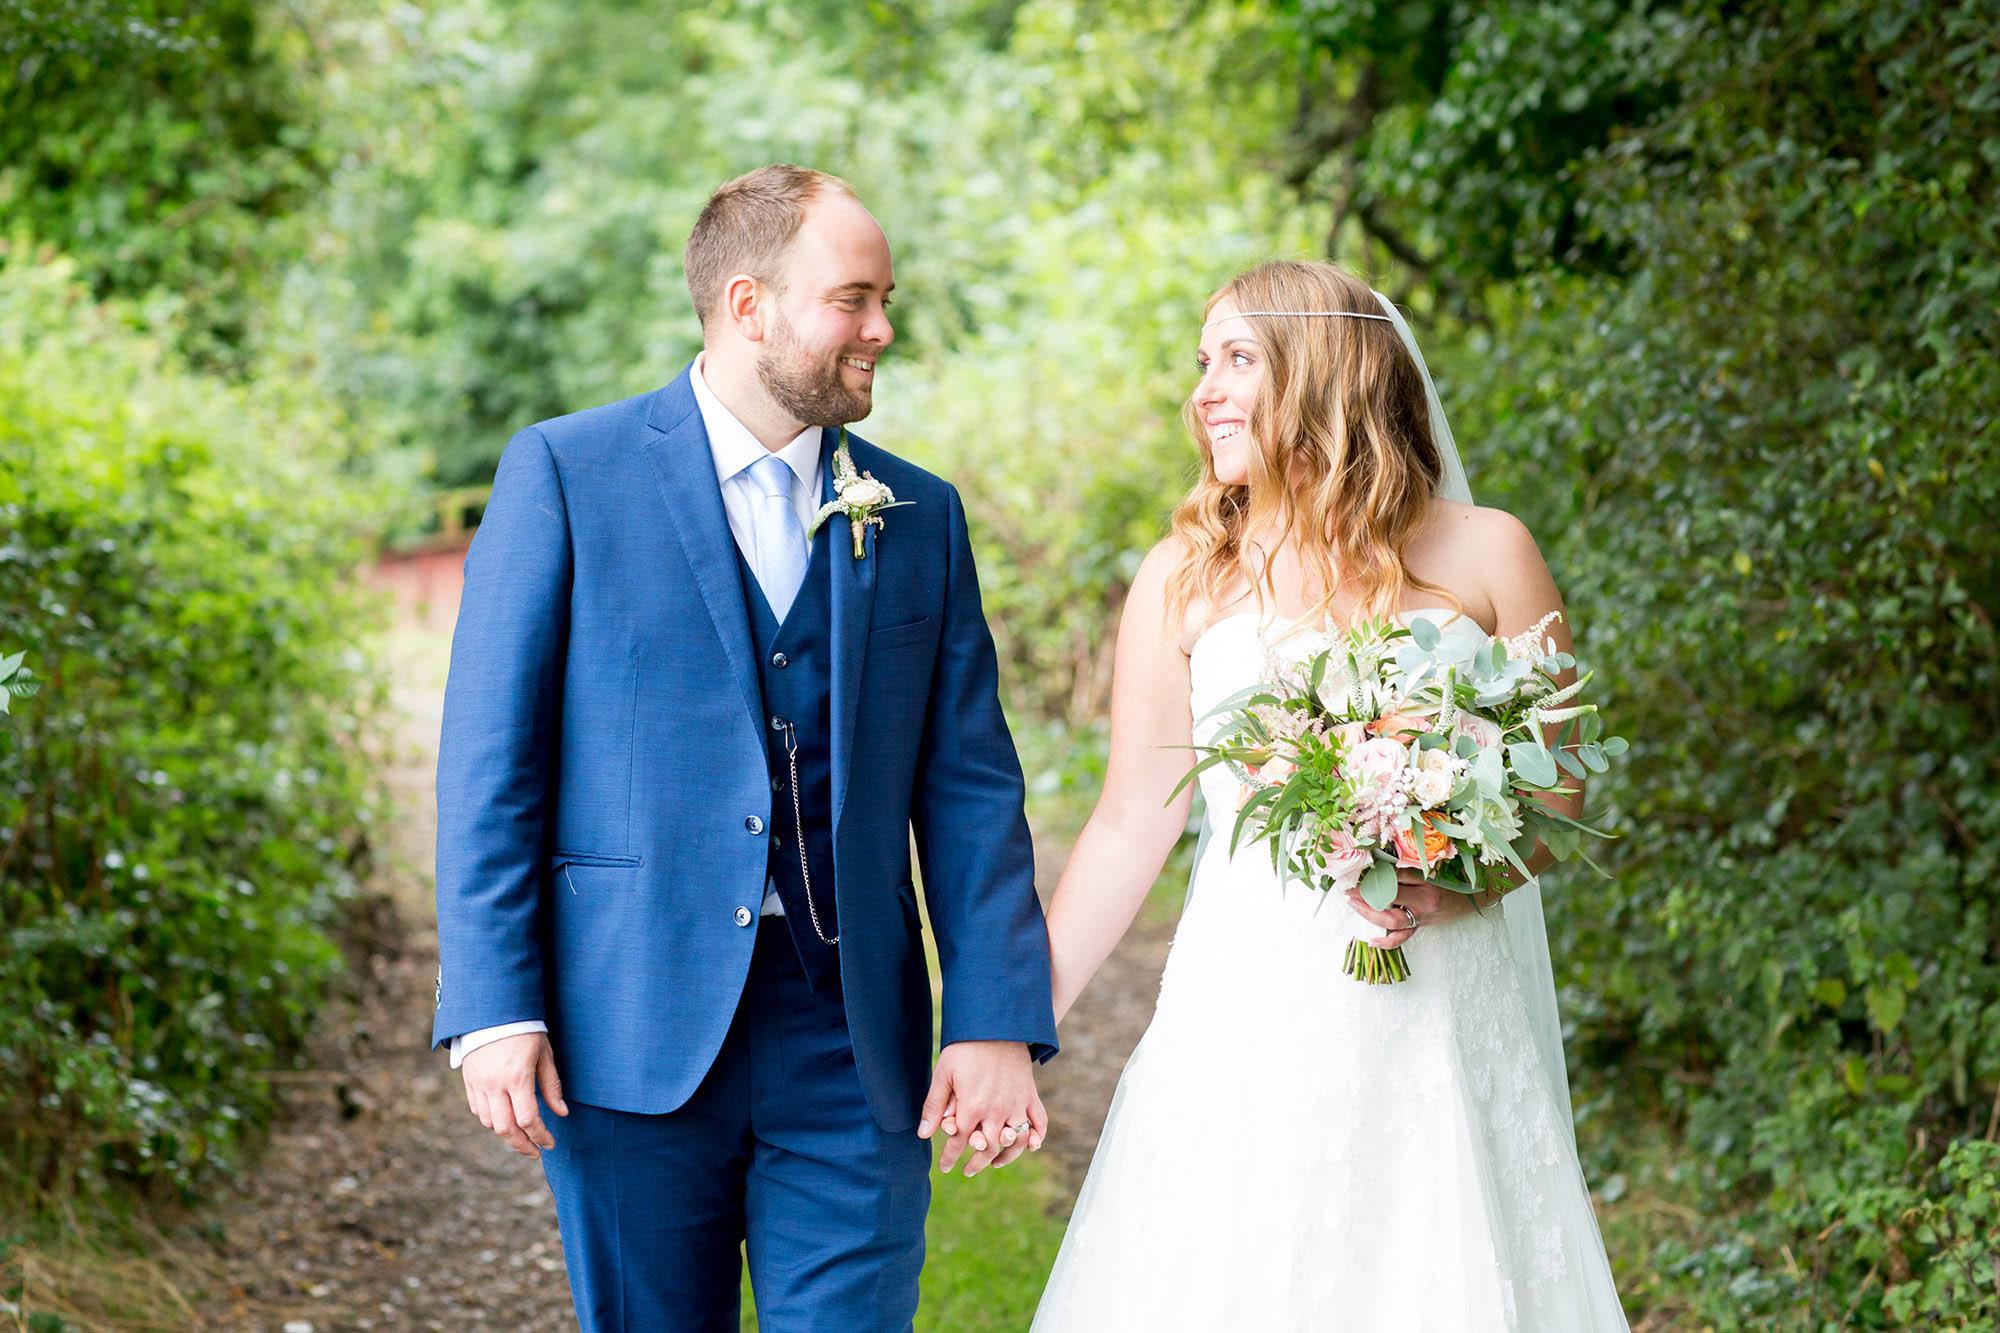 julia-toms-wedding-photographer-west-sussex-001.jpg